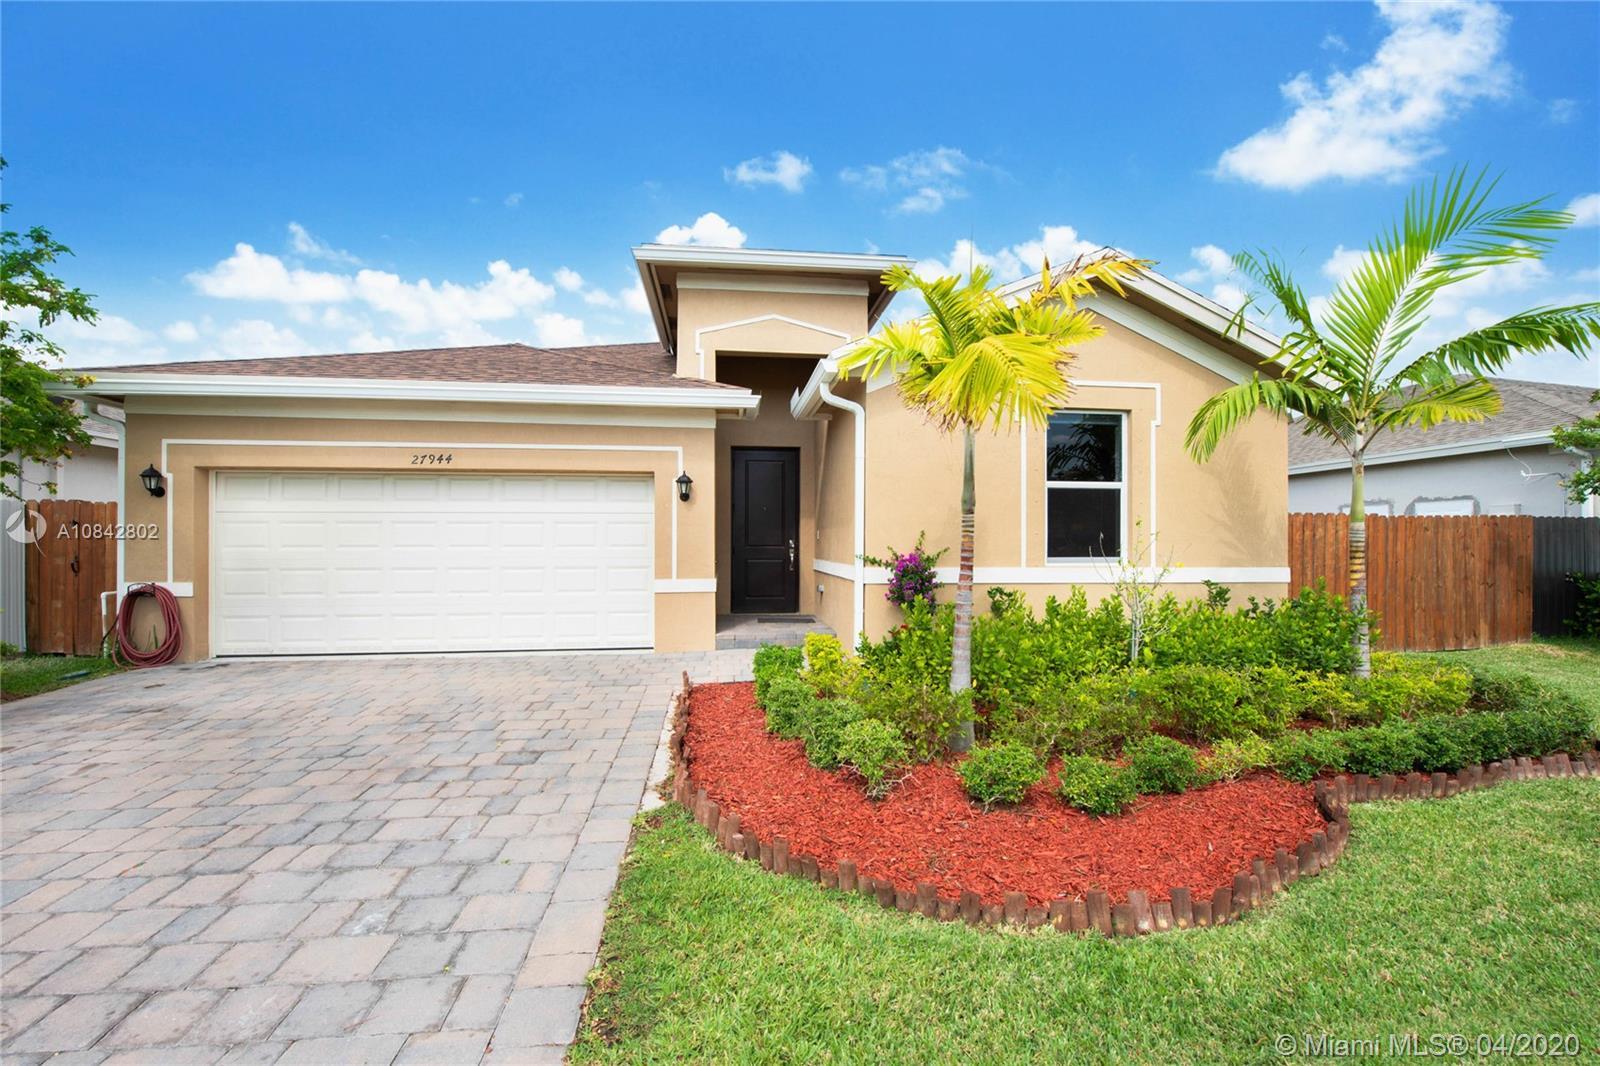 27944 SW 133rd Path, Homestead, FL 33032 - Homestead, FL real estate listing